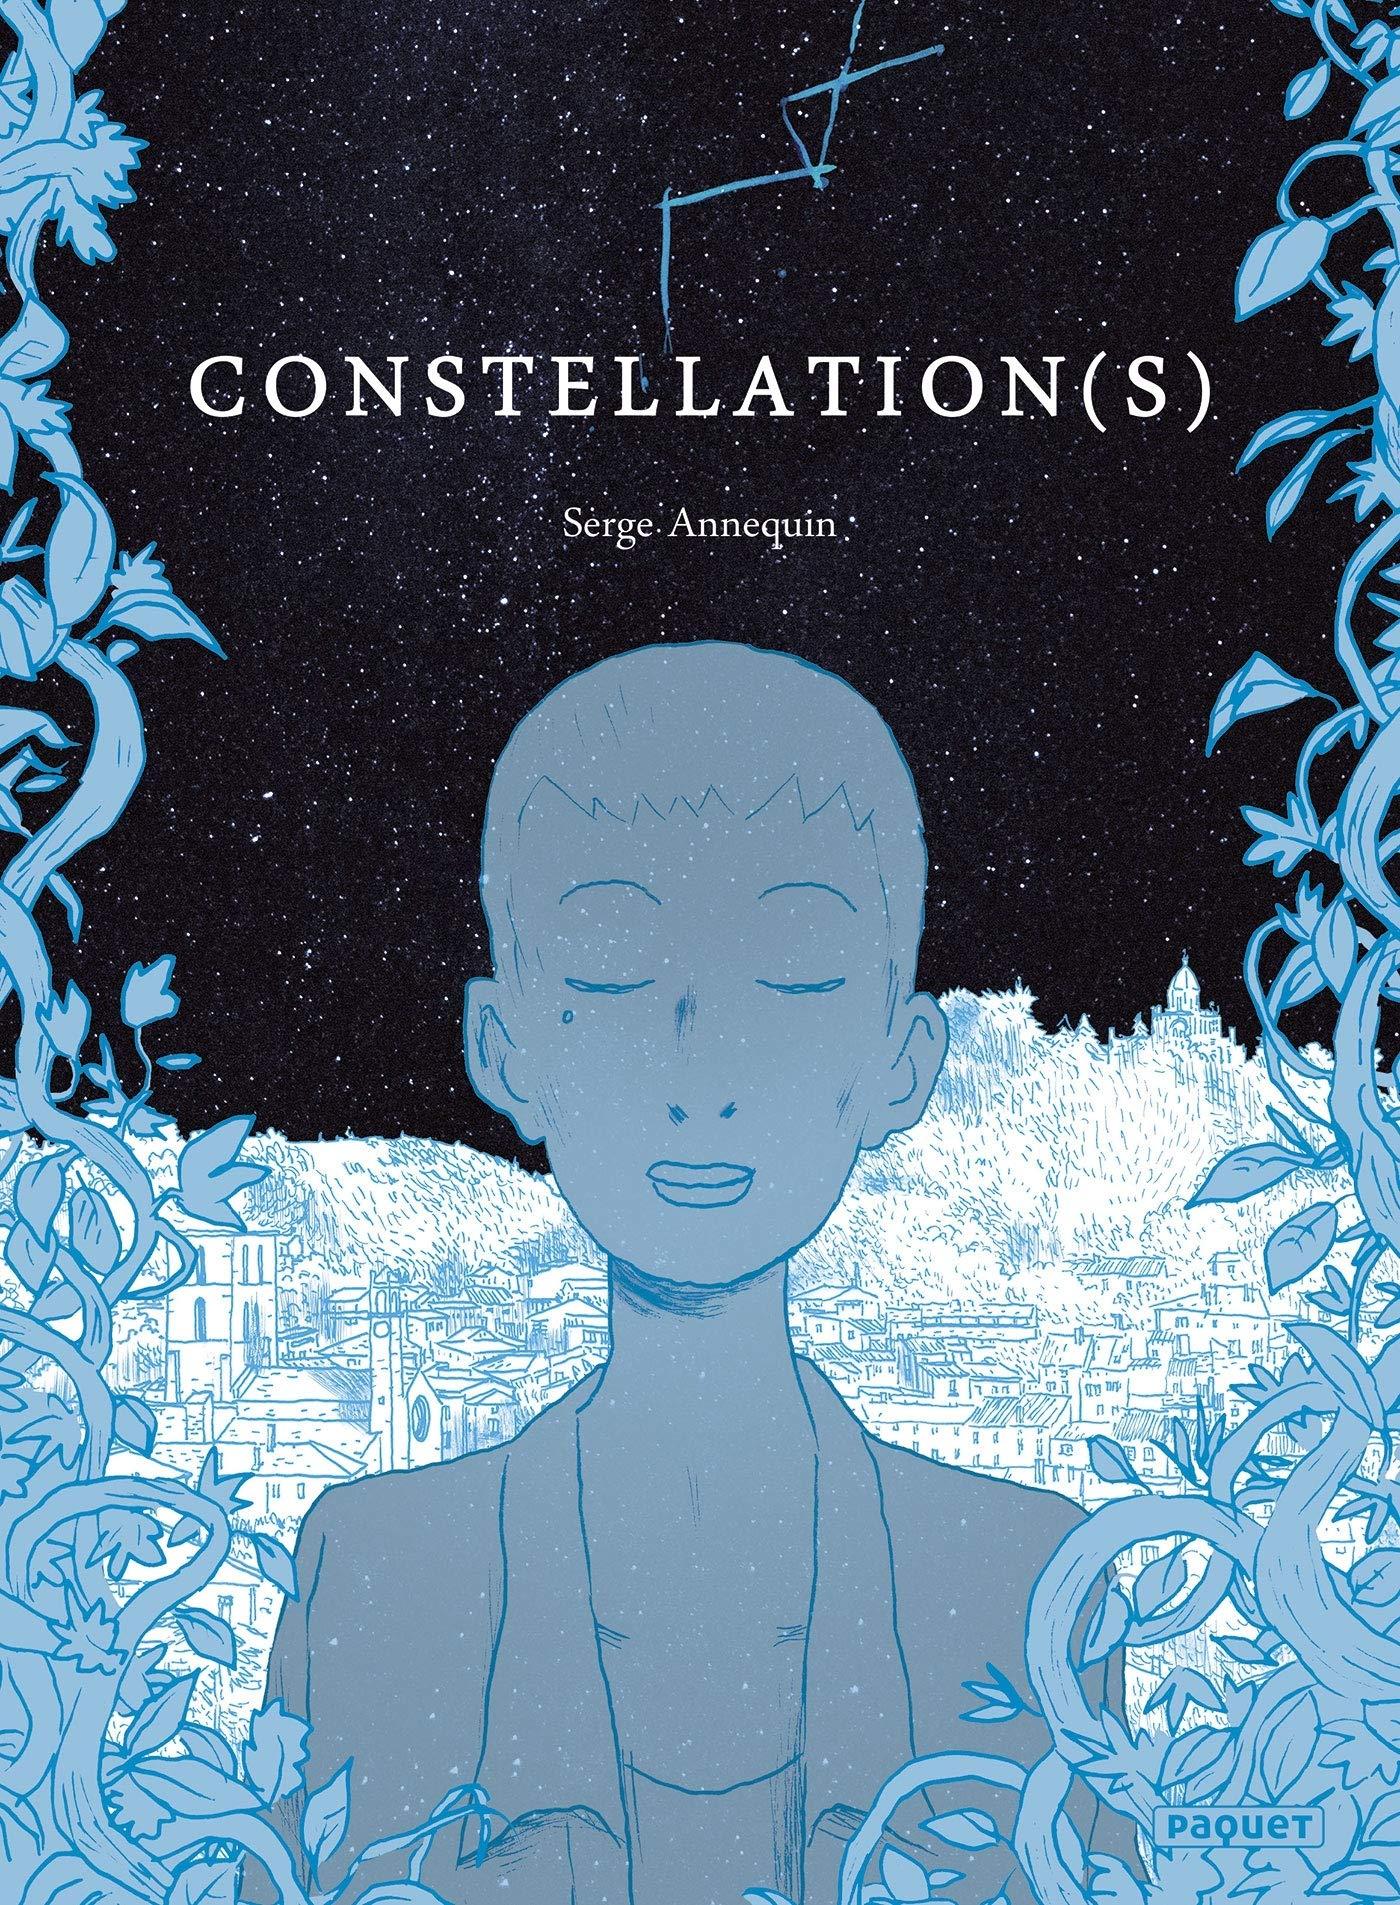 Constellations 0